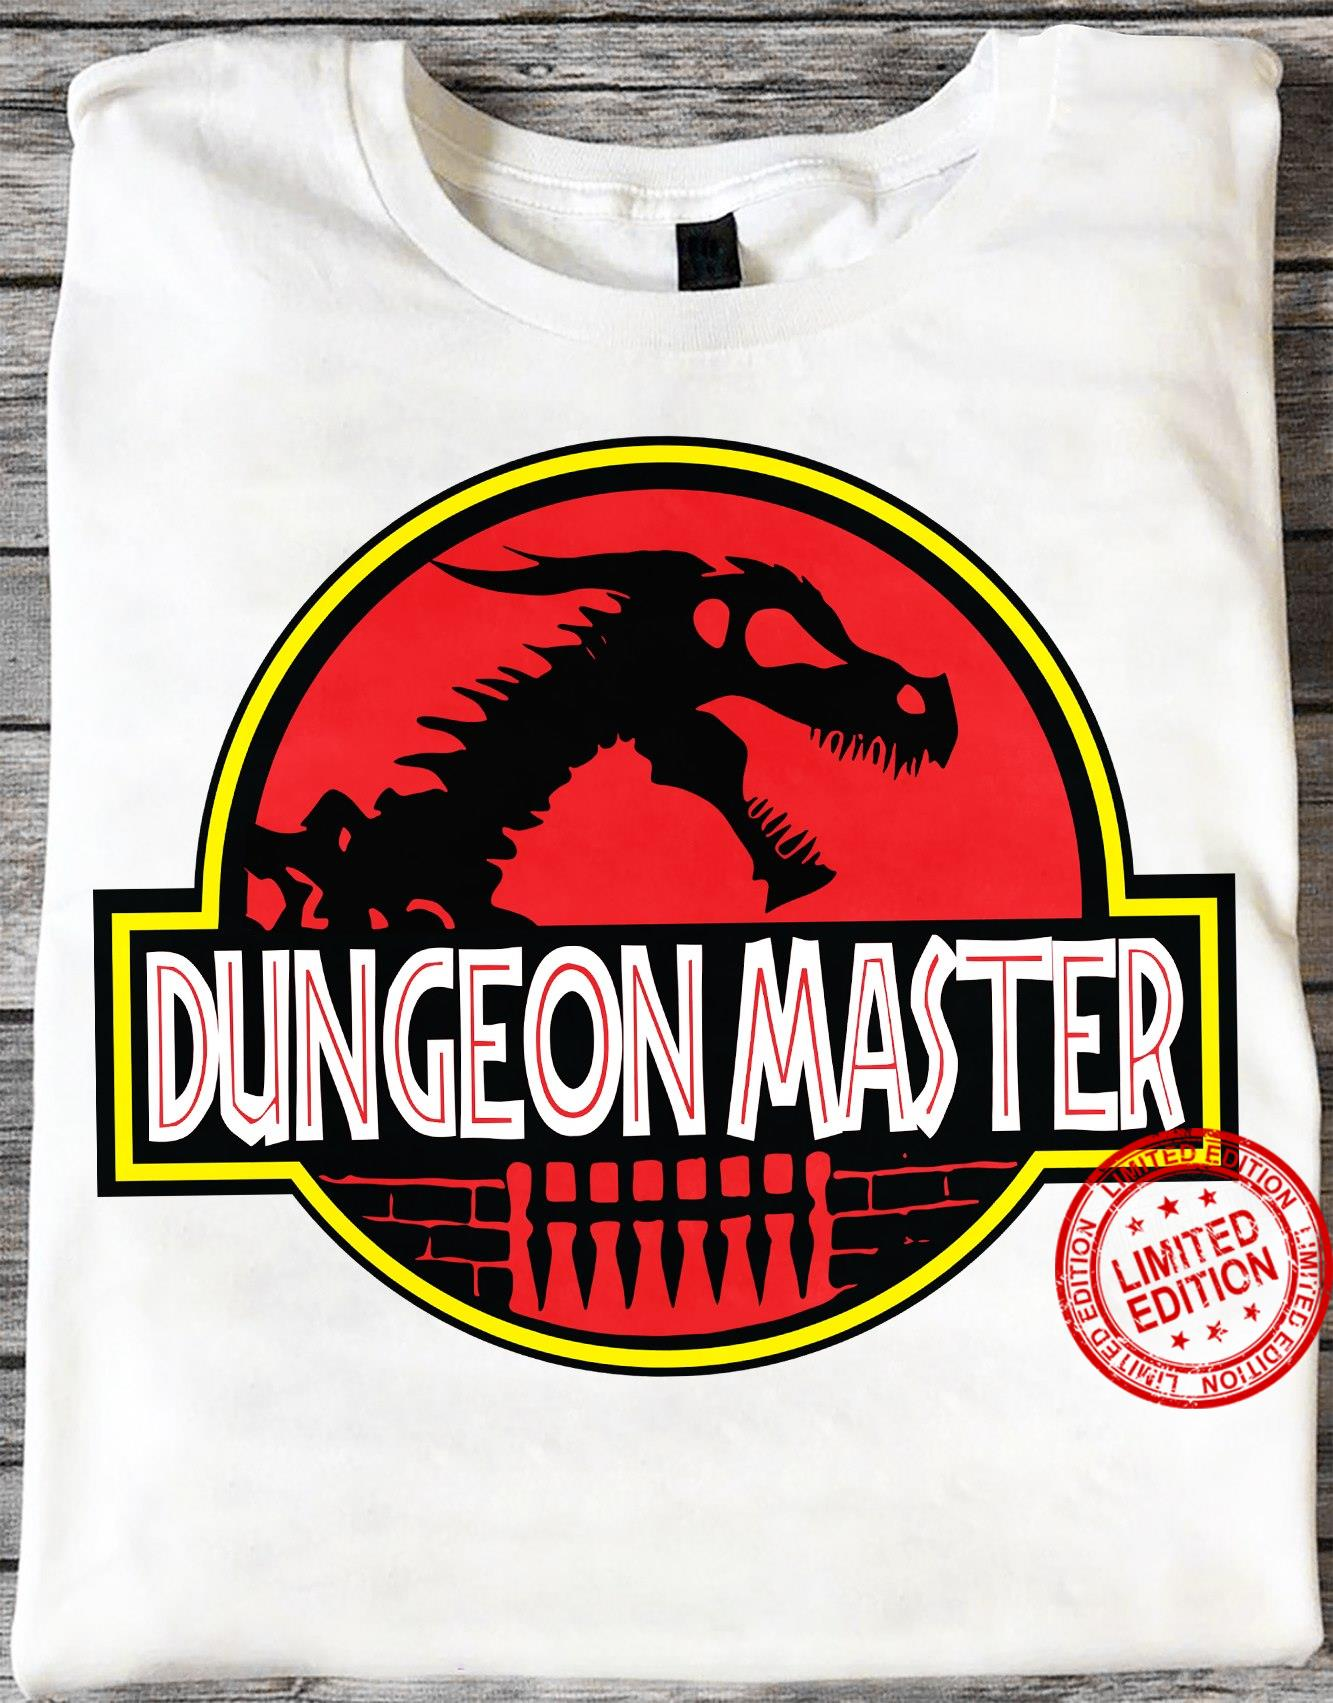 Gungeon Master Shirt